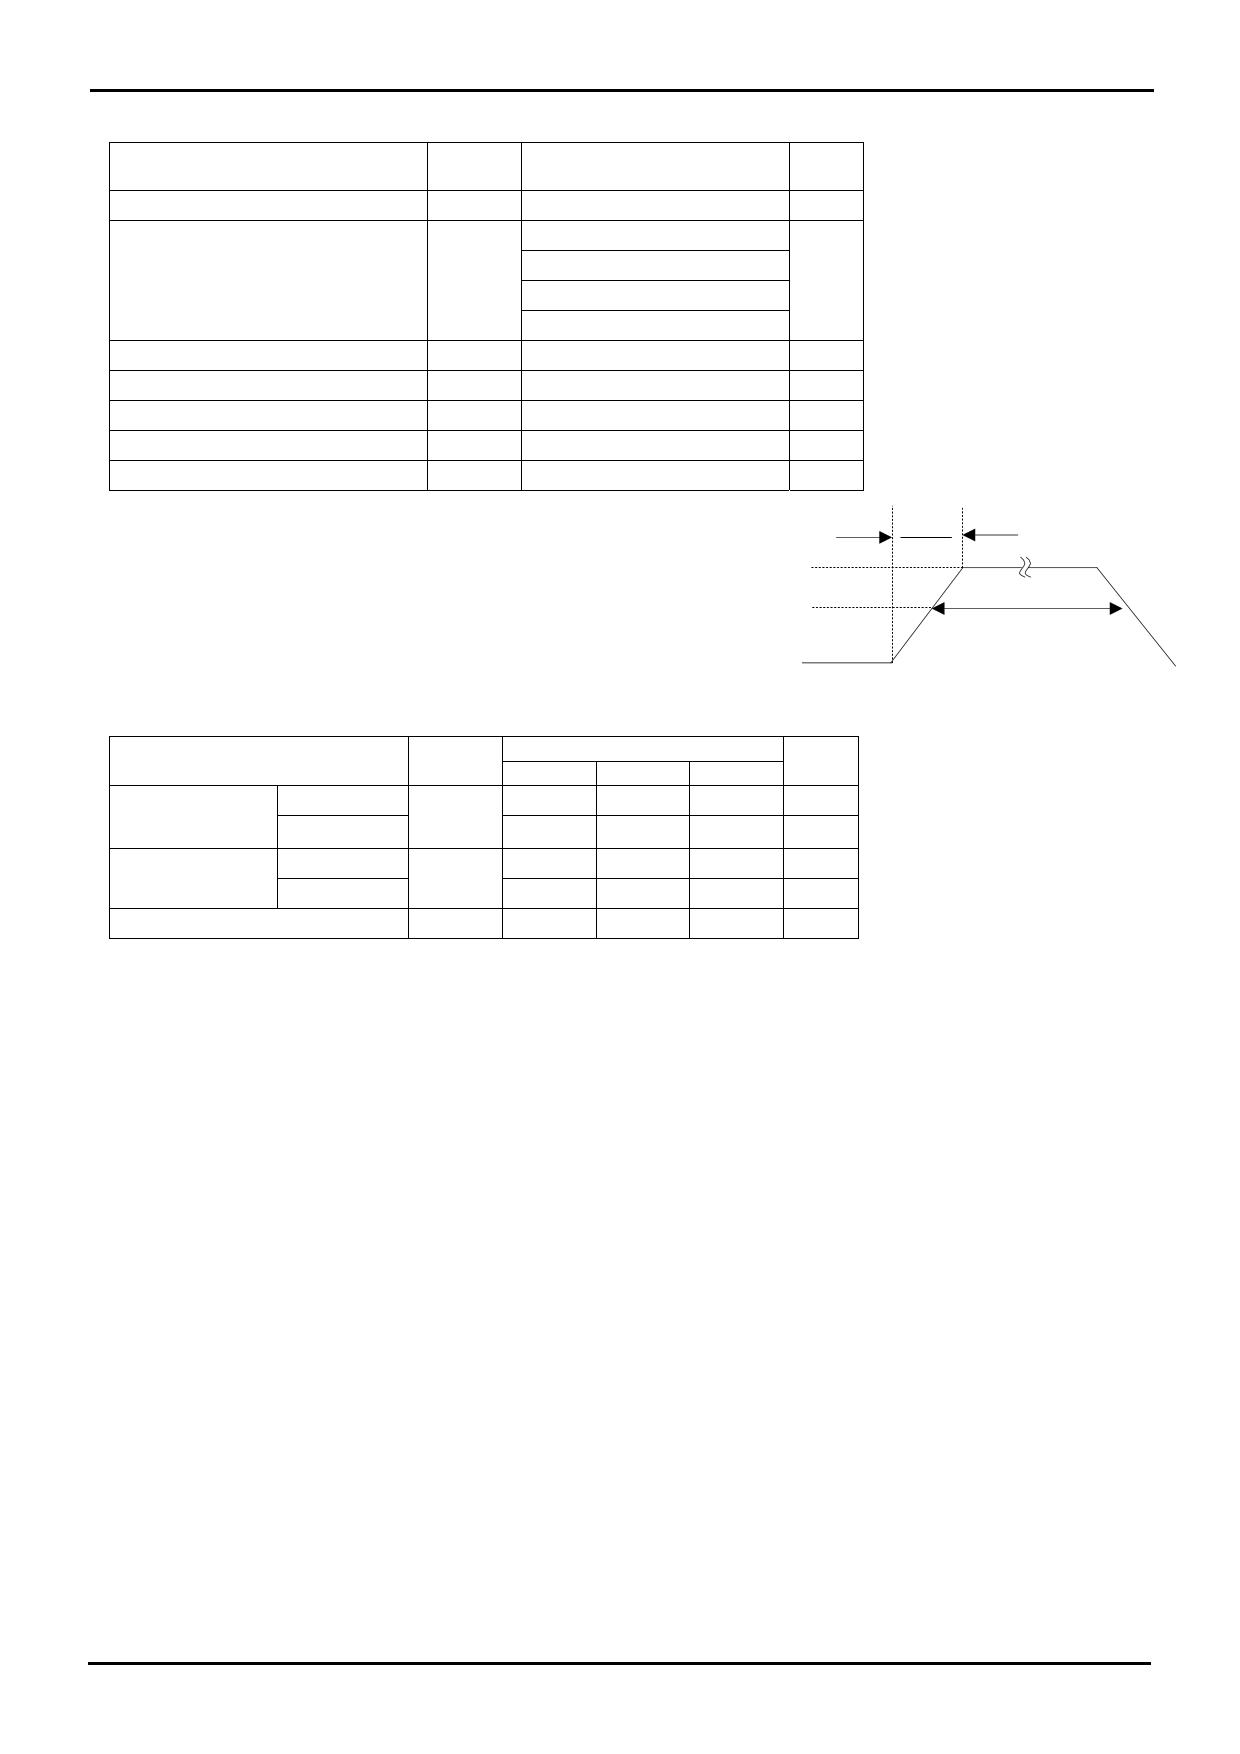 BA05CC0WFP-E2 pdf